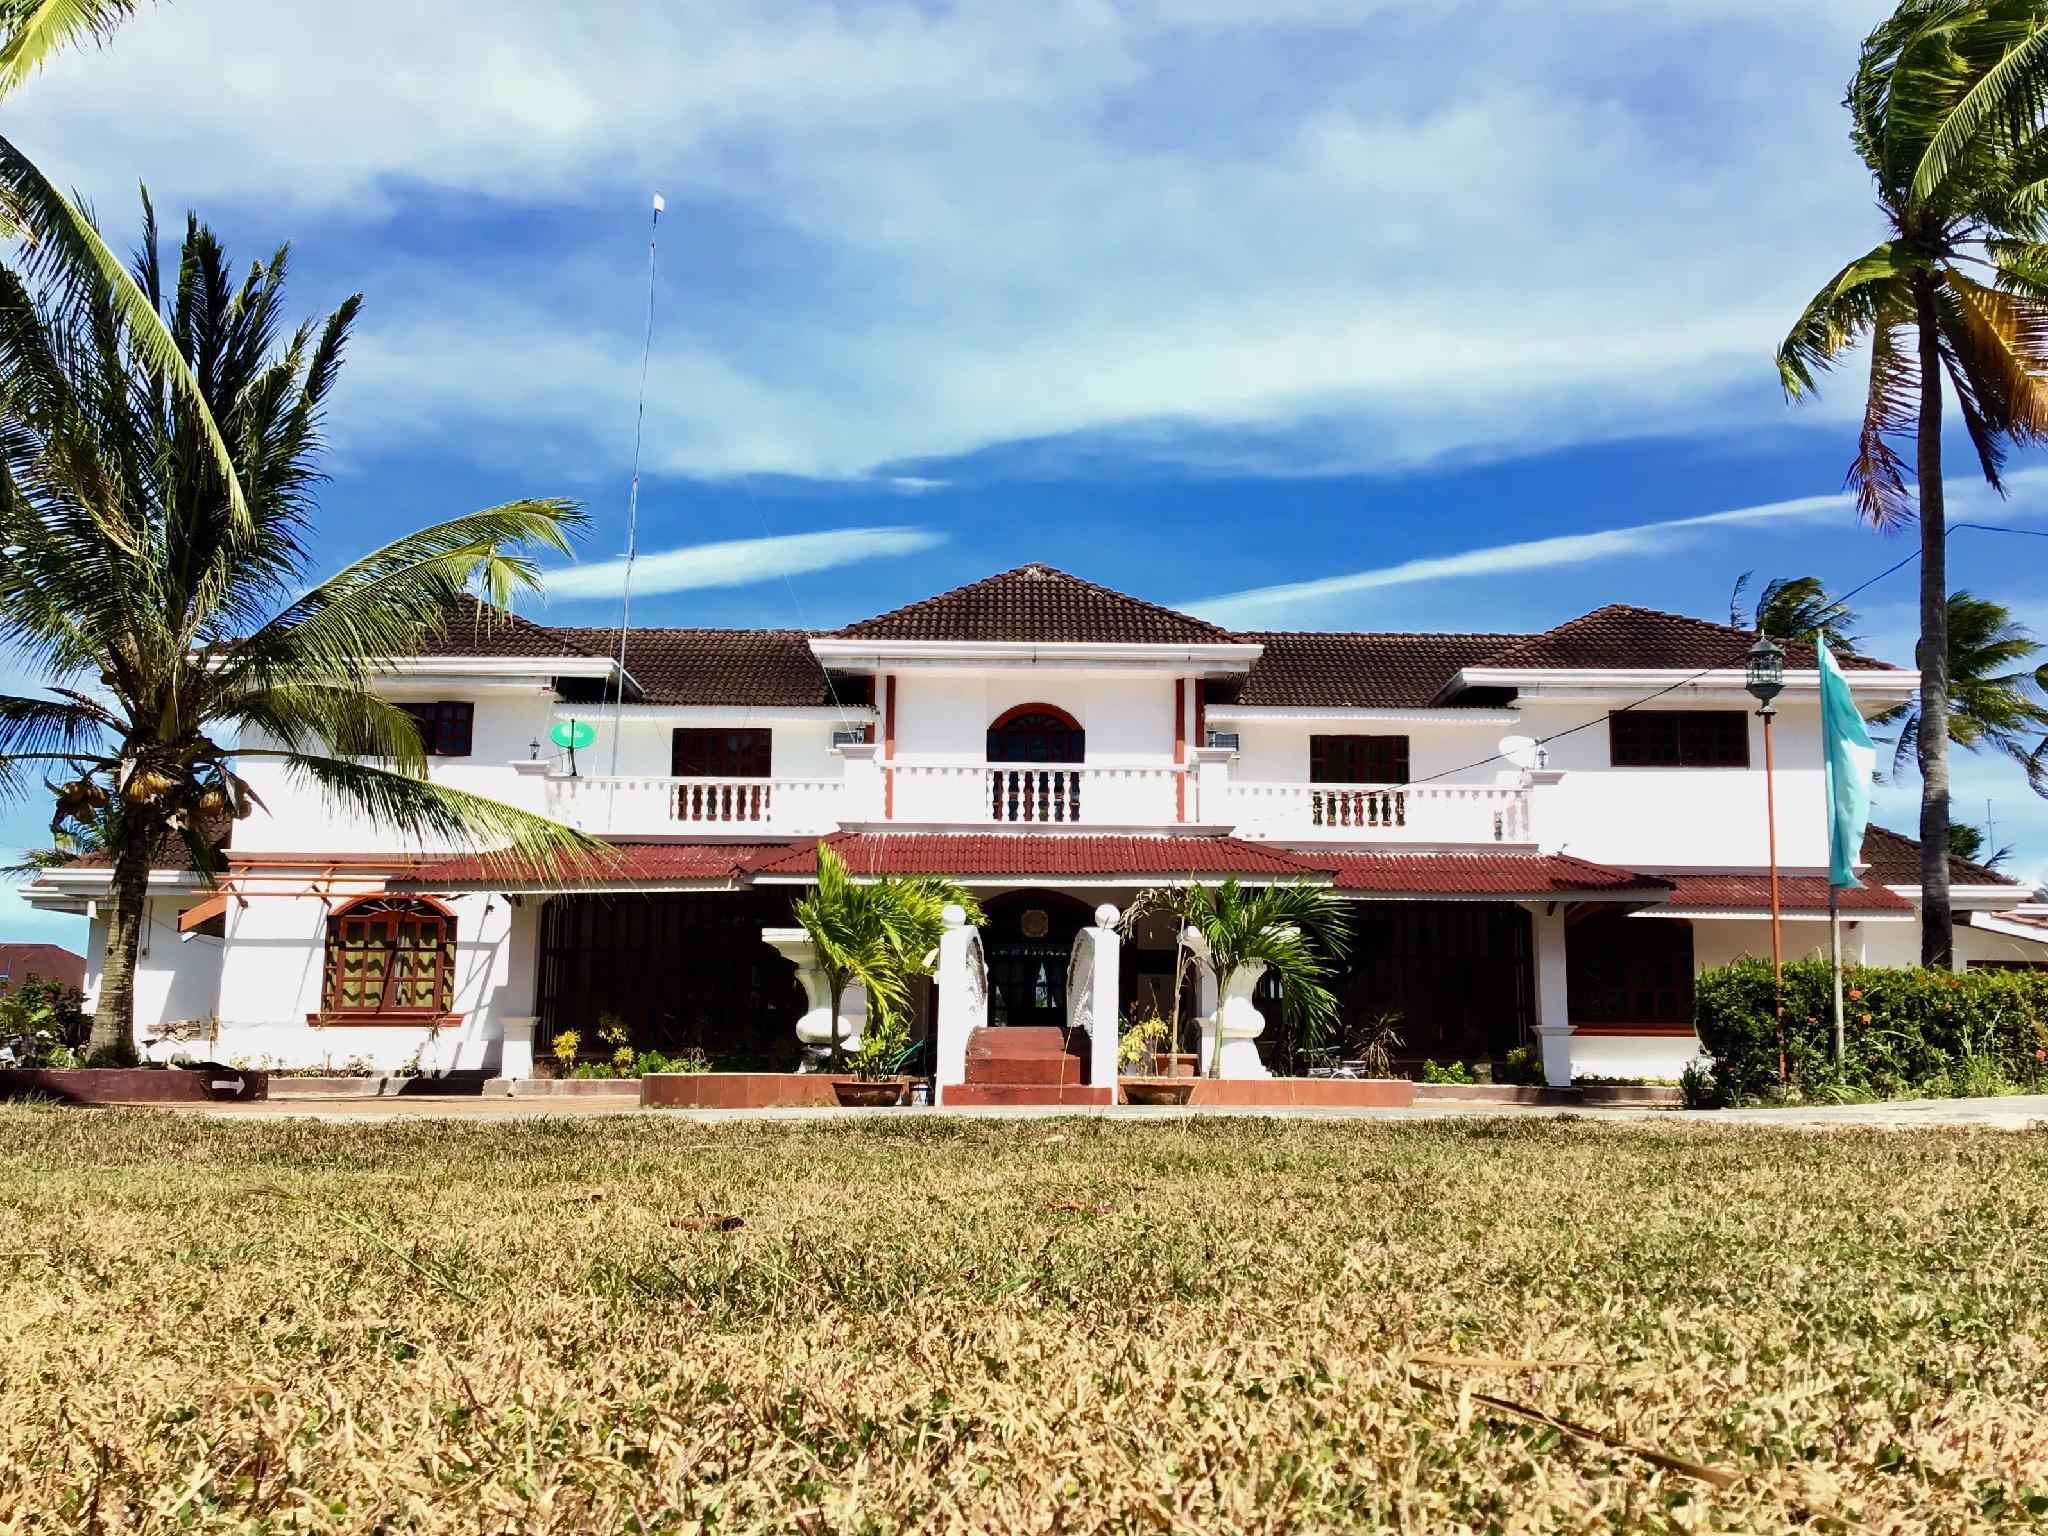 Playa De Paraiso Resort